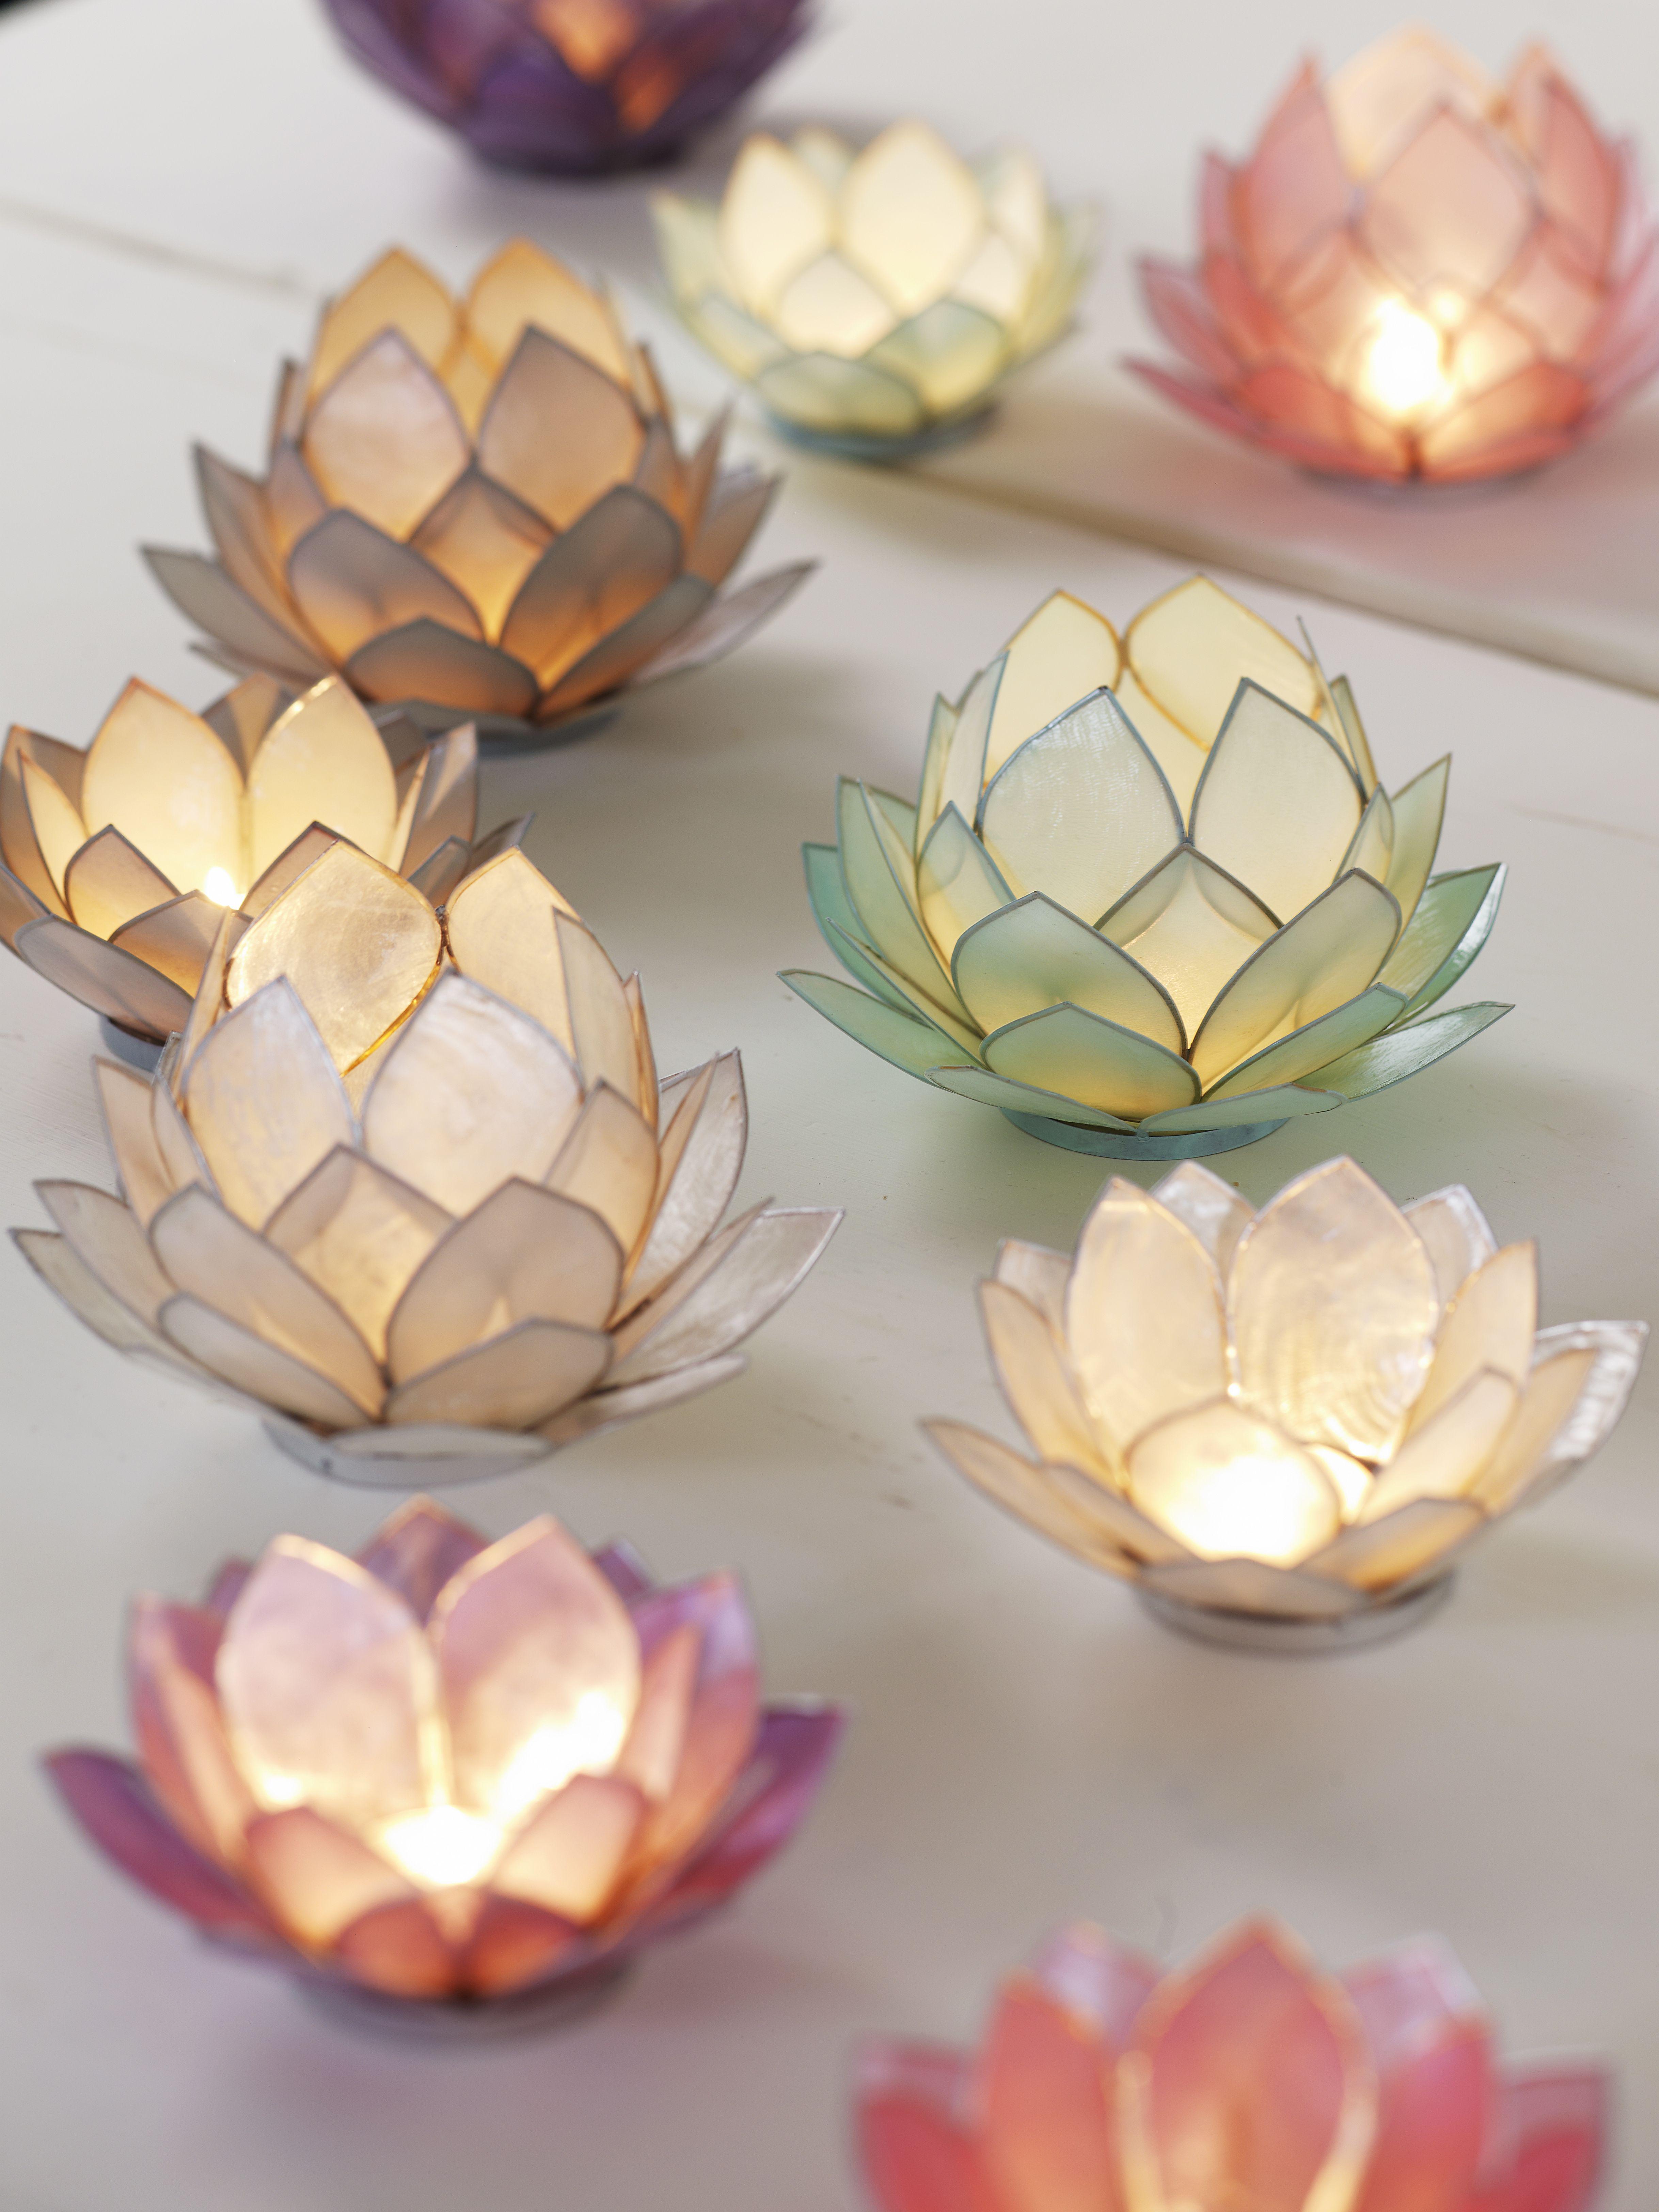 Lotus candleholders my style pinterest candleholders lotus